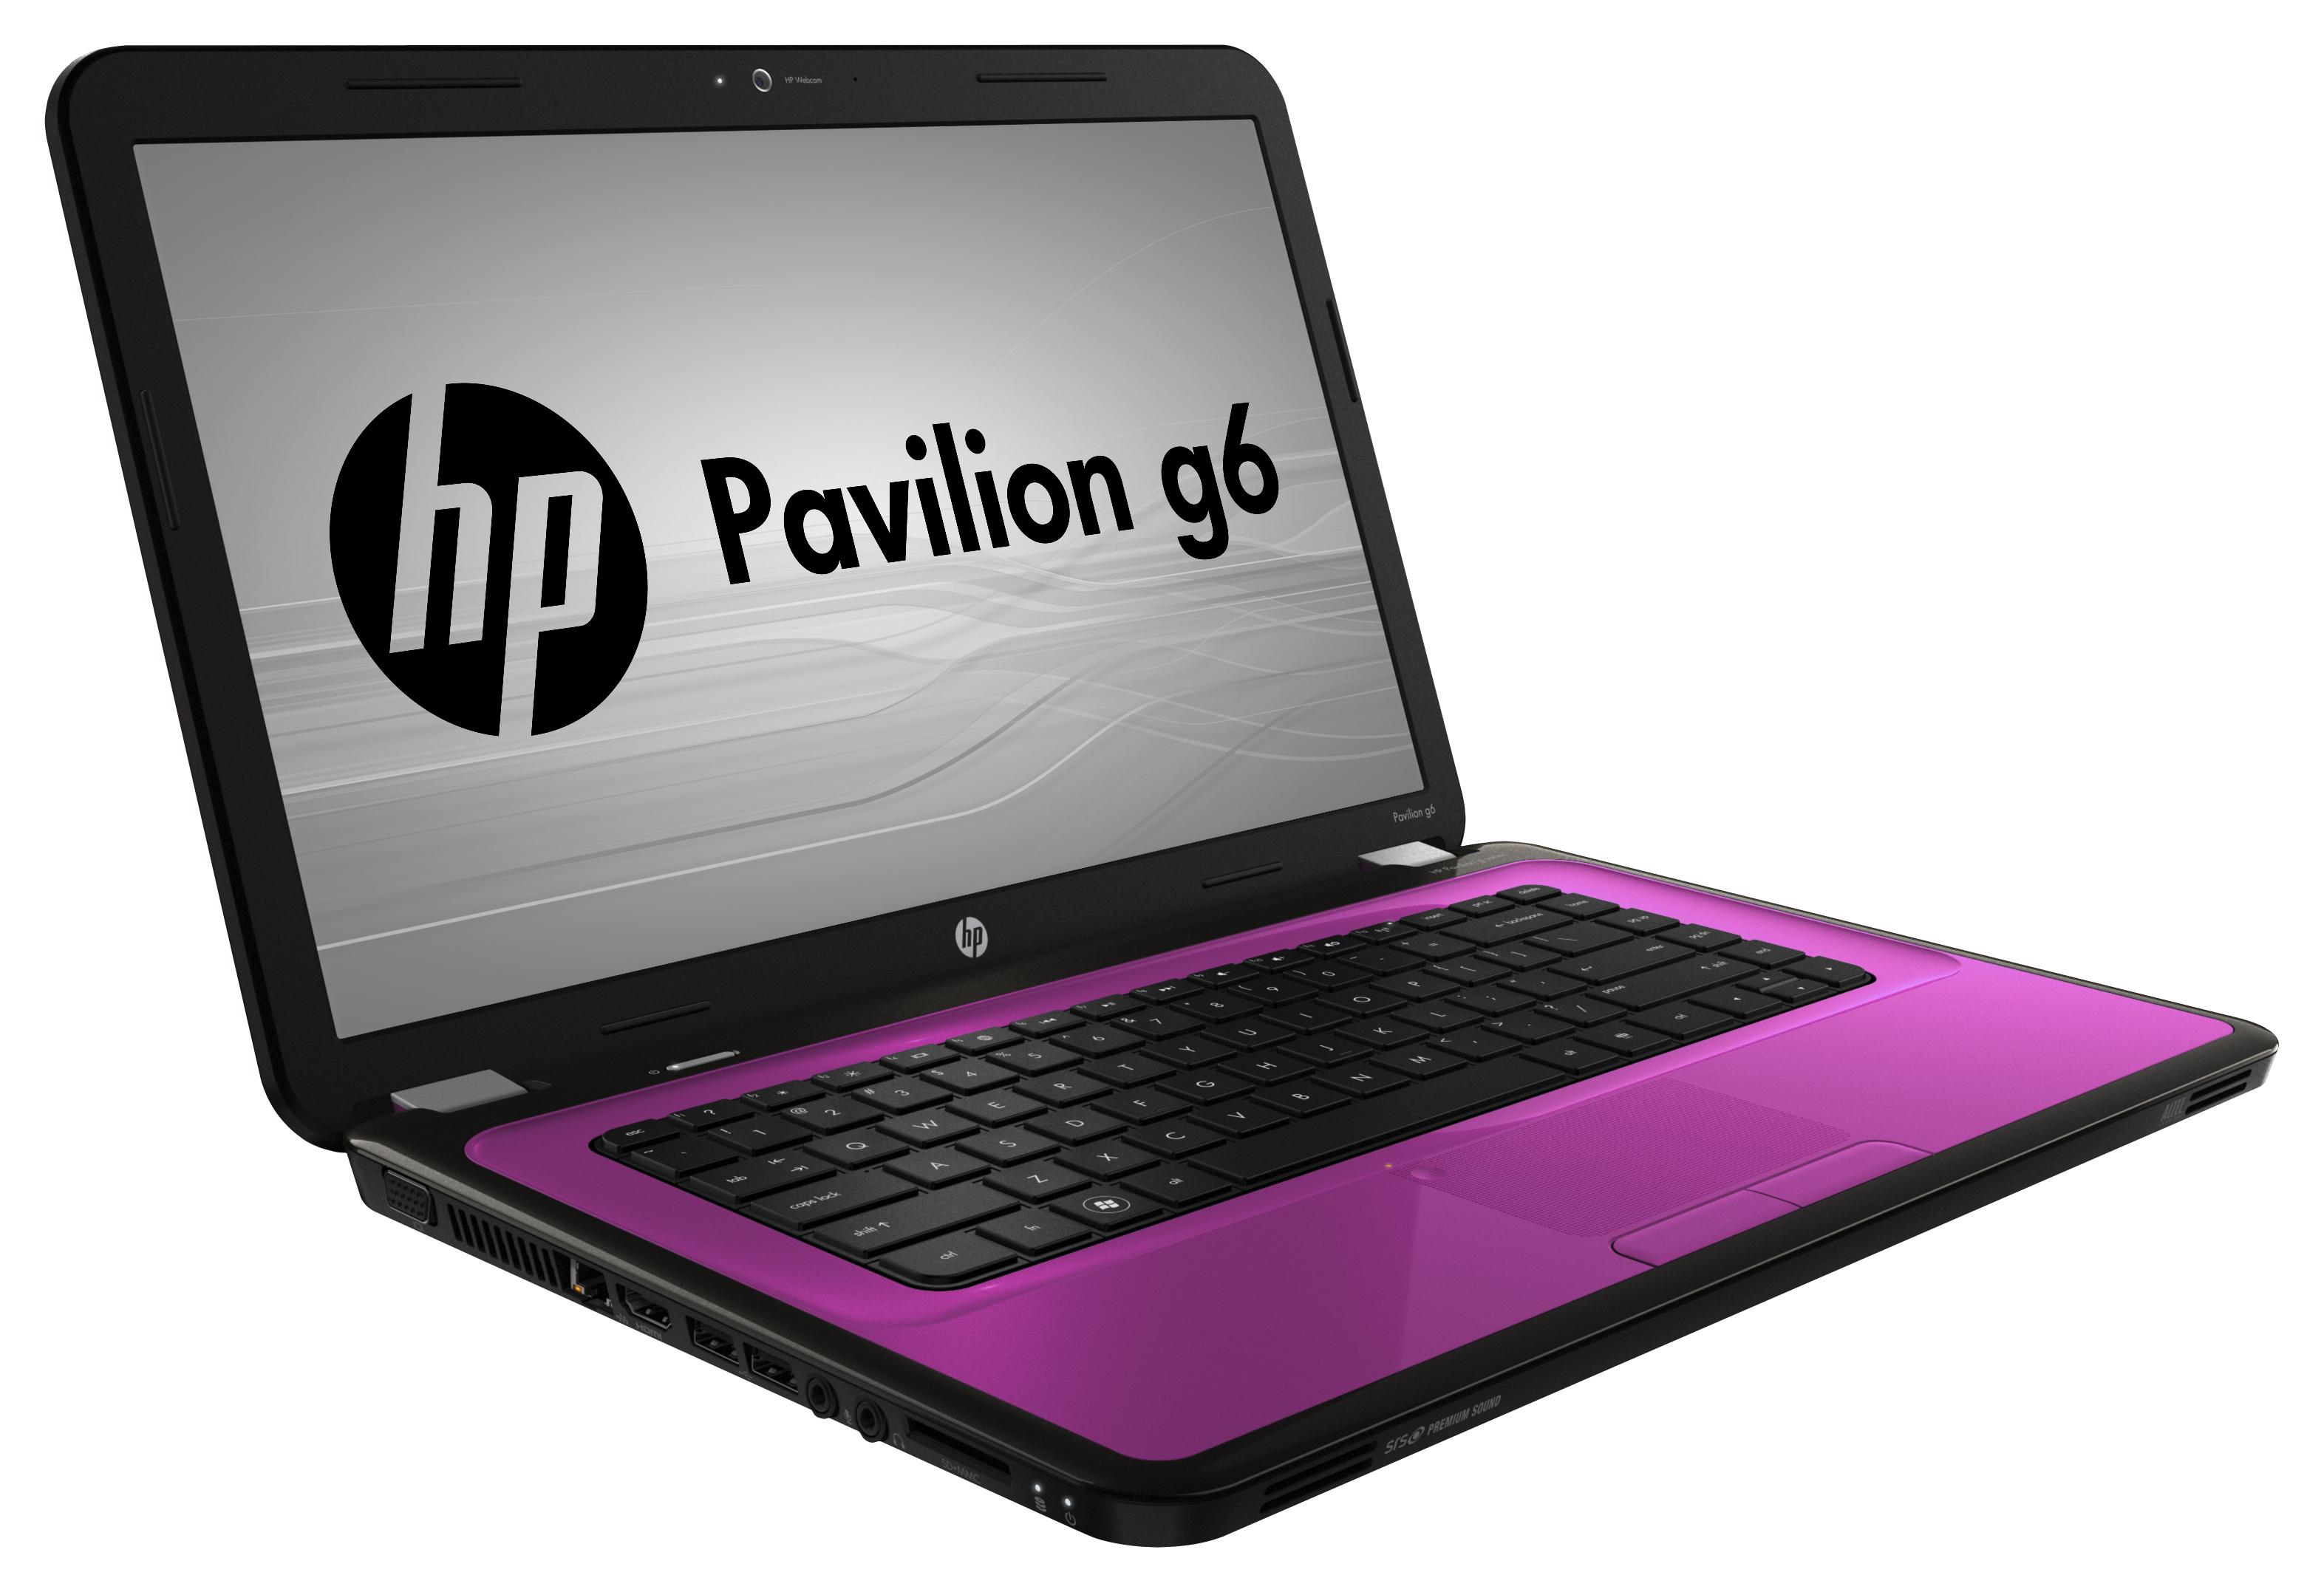 specs hp pavilion g6 1327sa ddr3 sdram notebook 39 6 cm 15 6 1366 x 768 pixels amd e 4 gb 500 gb hdd windows 7 home premium pink notebooks a8m64ea